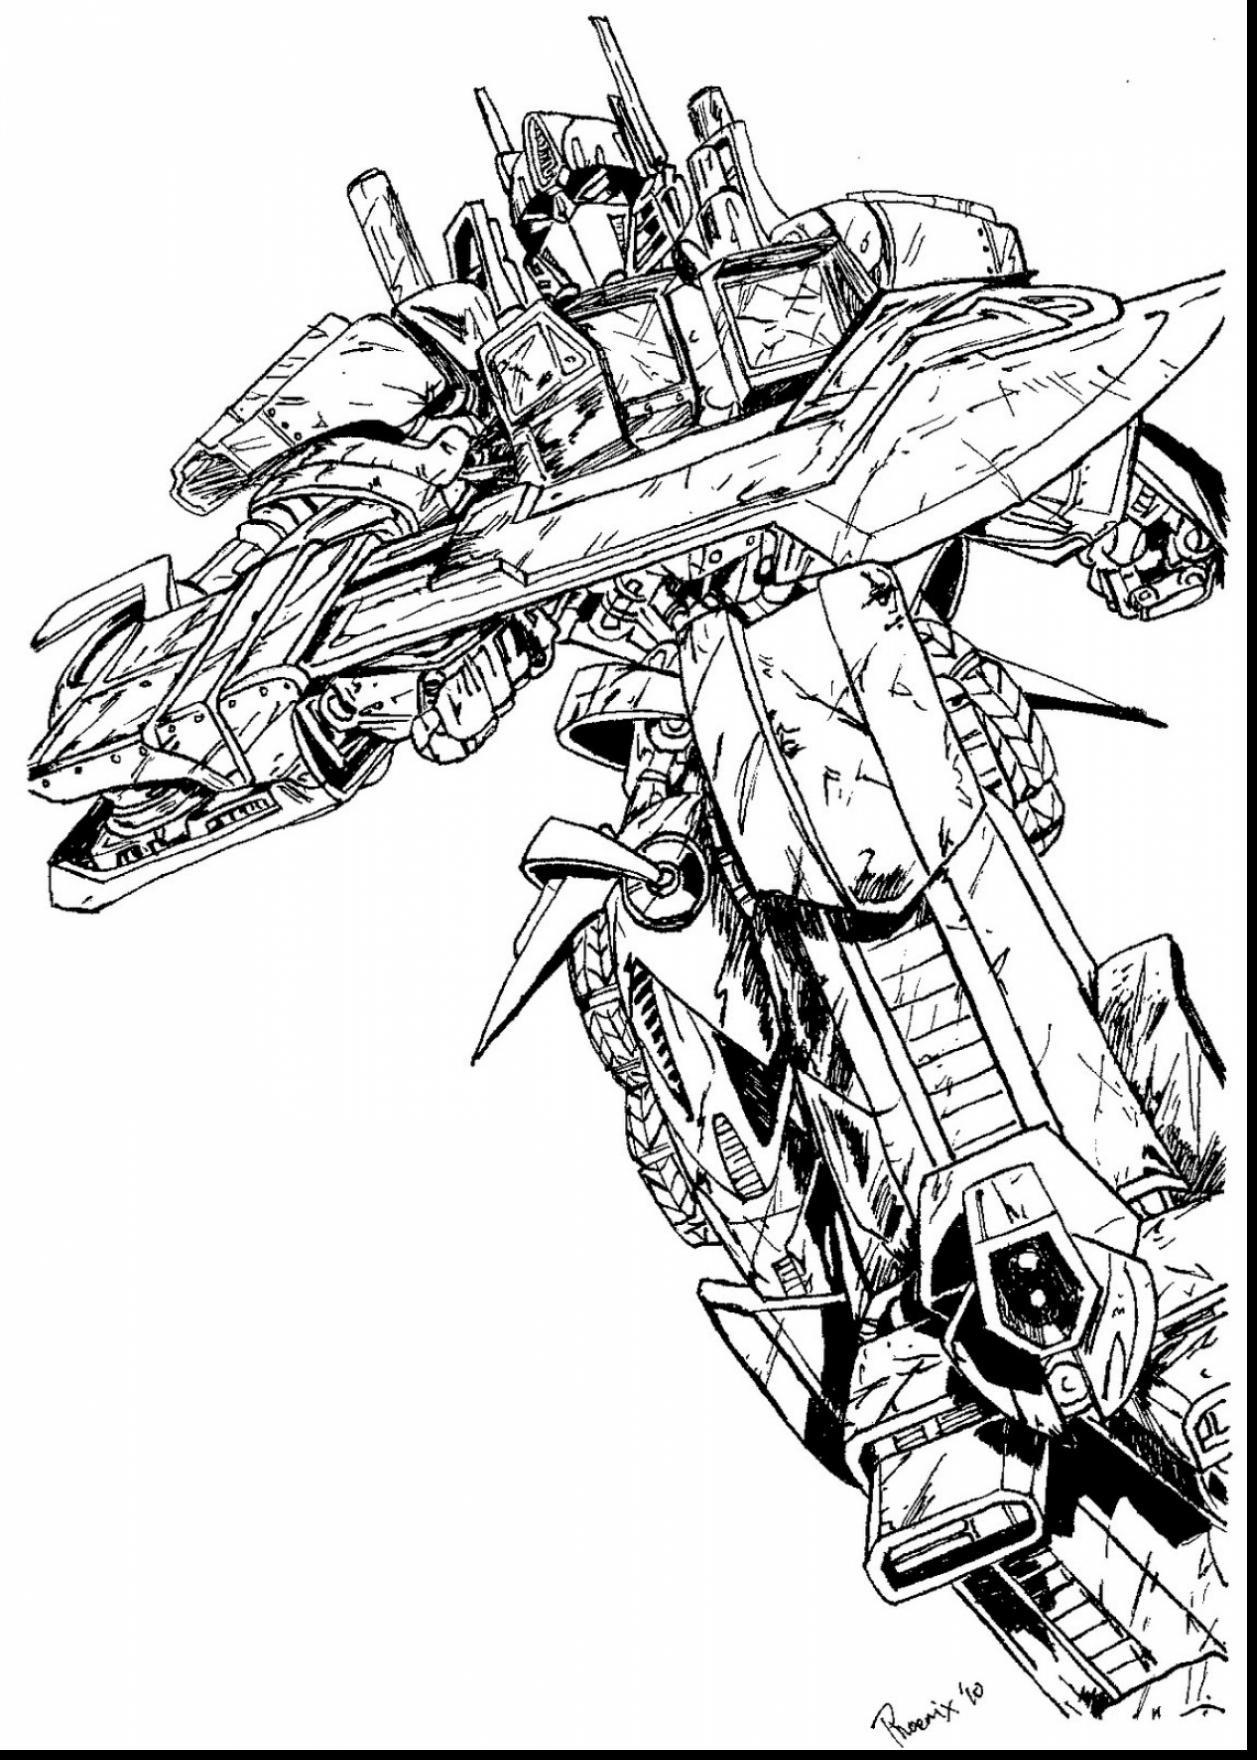 Transformers 4 Drawing At Getdrawings